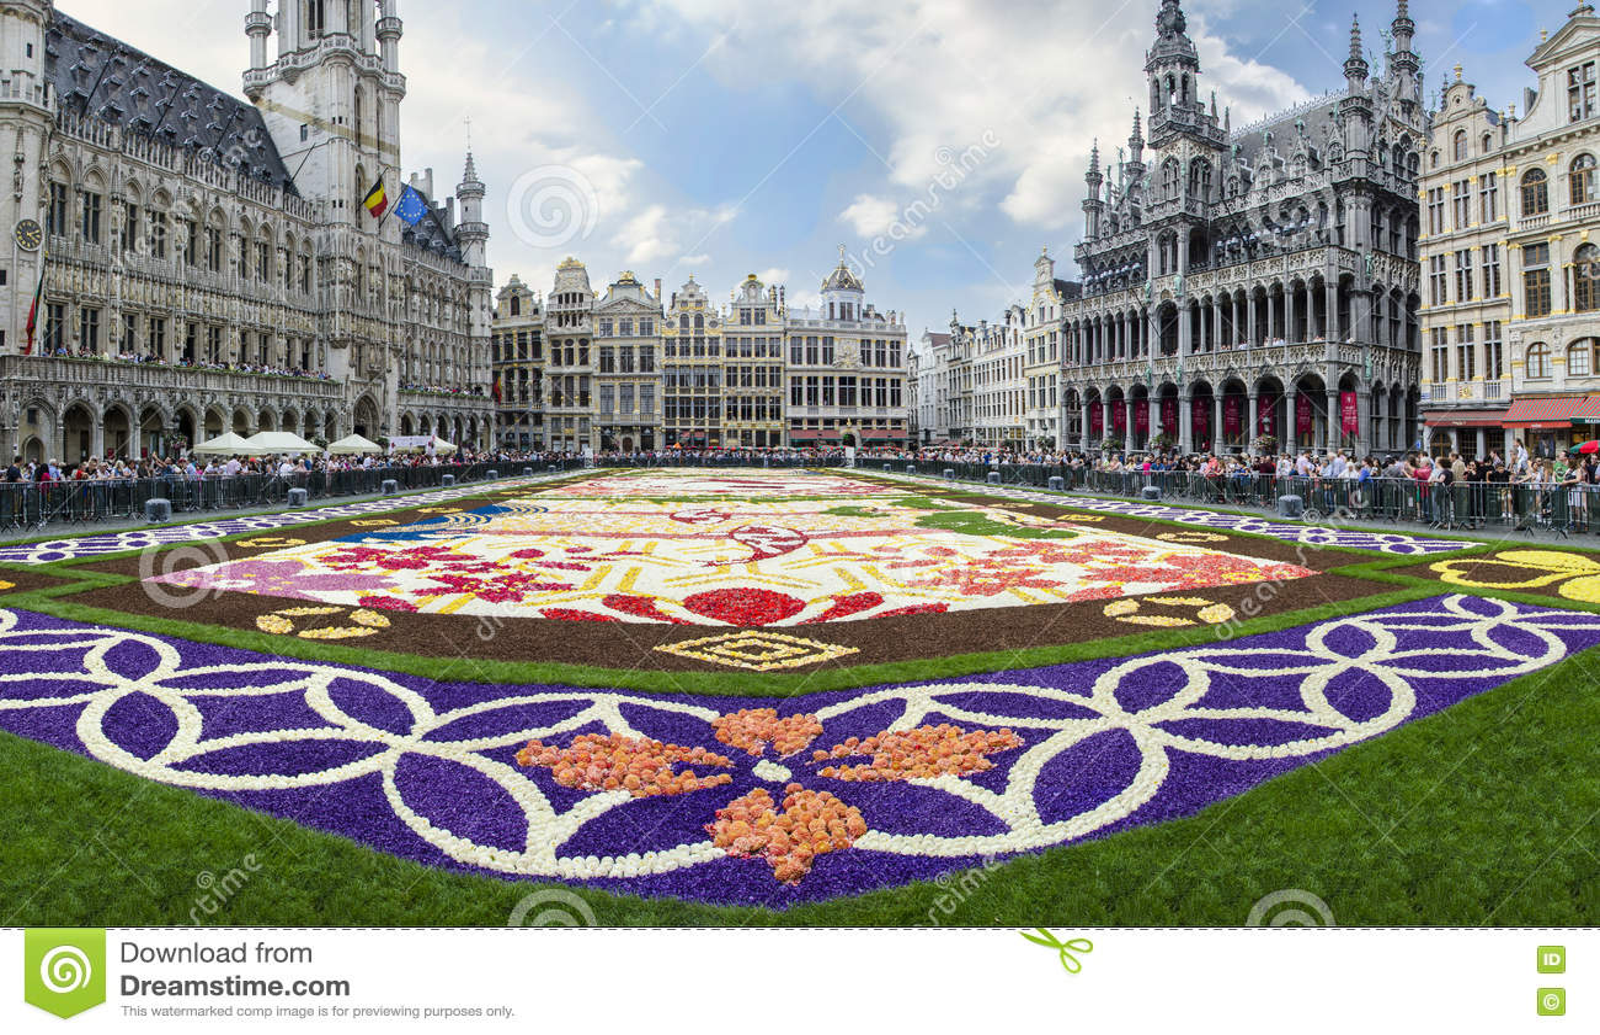 Tappeto Floreale Bruxelles : Tappeti floreali awesome tappeto orientale tappeto cinese rosa